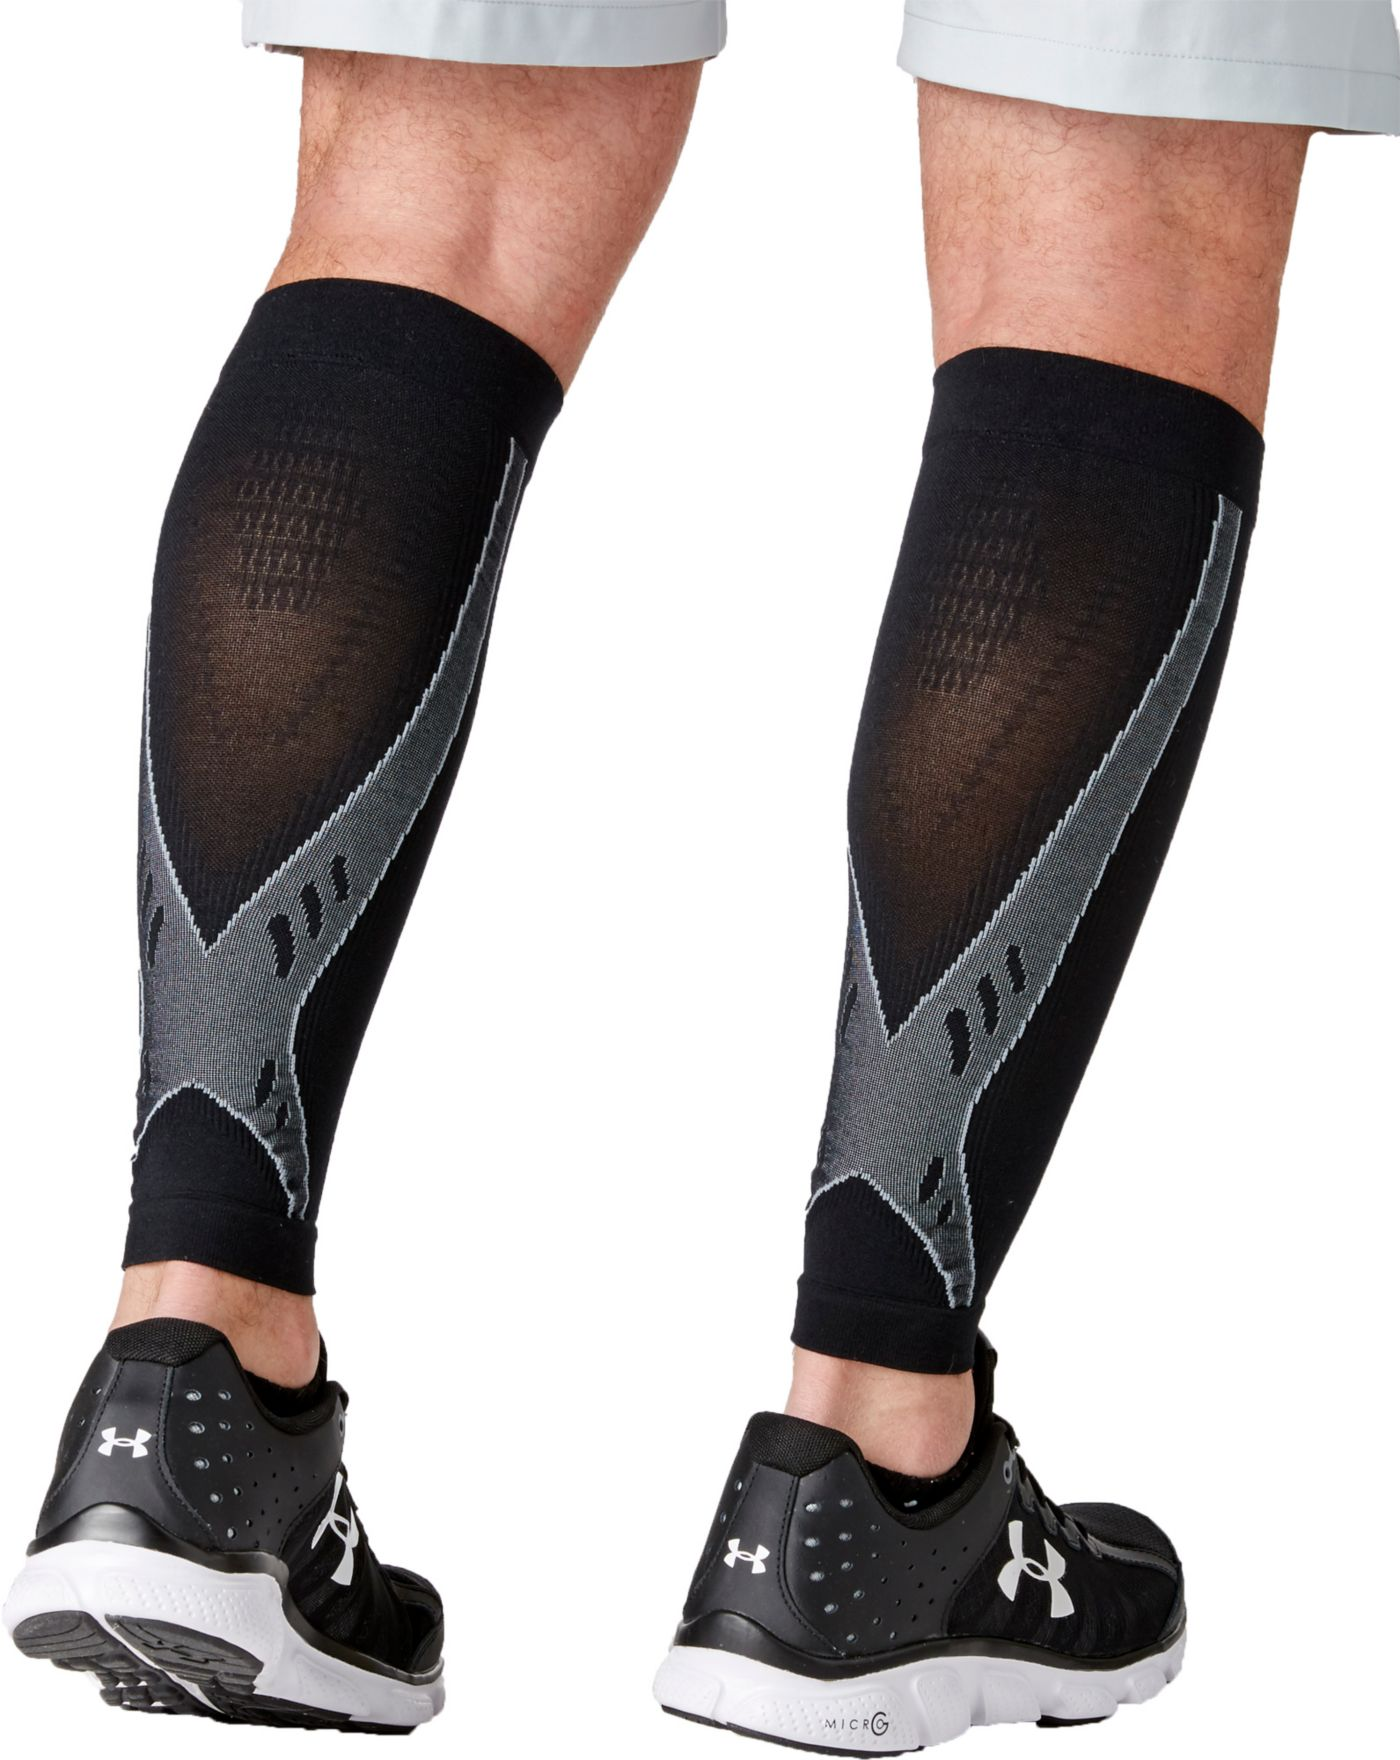 P-TEX PRO Knit Compression Calf Sleeve